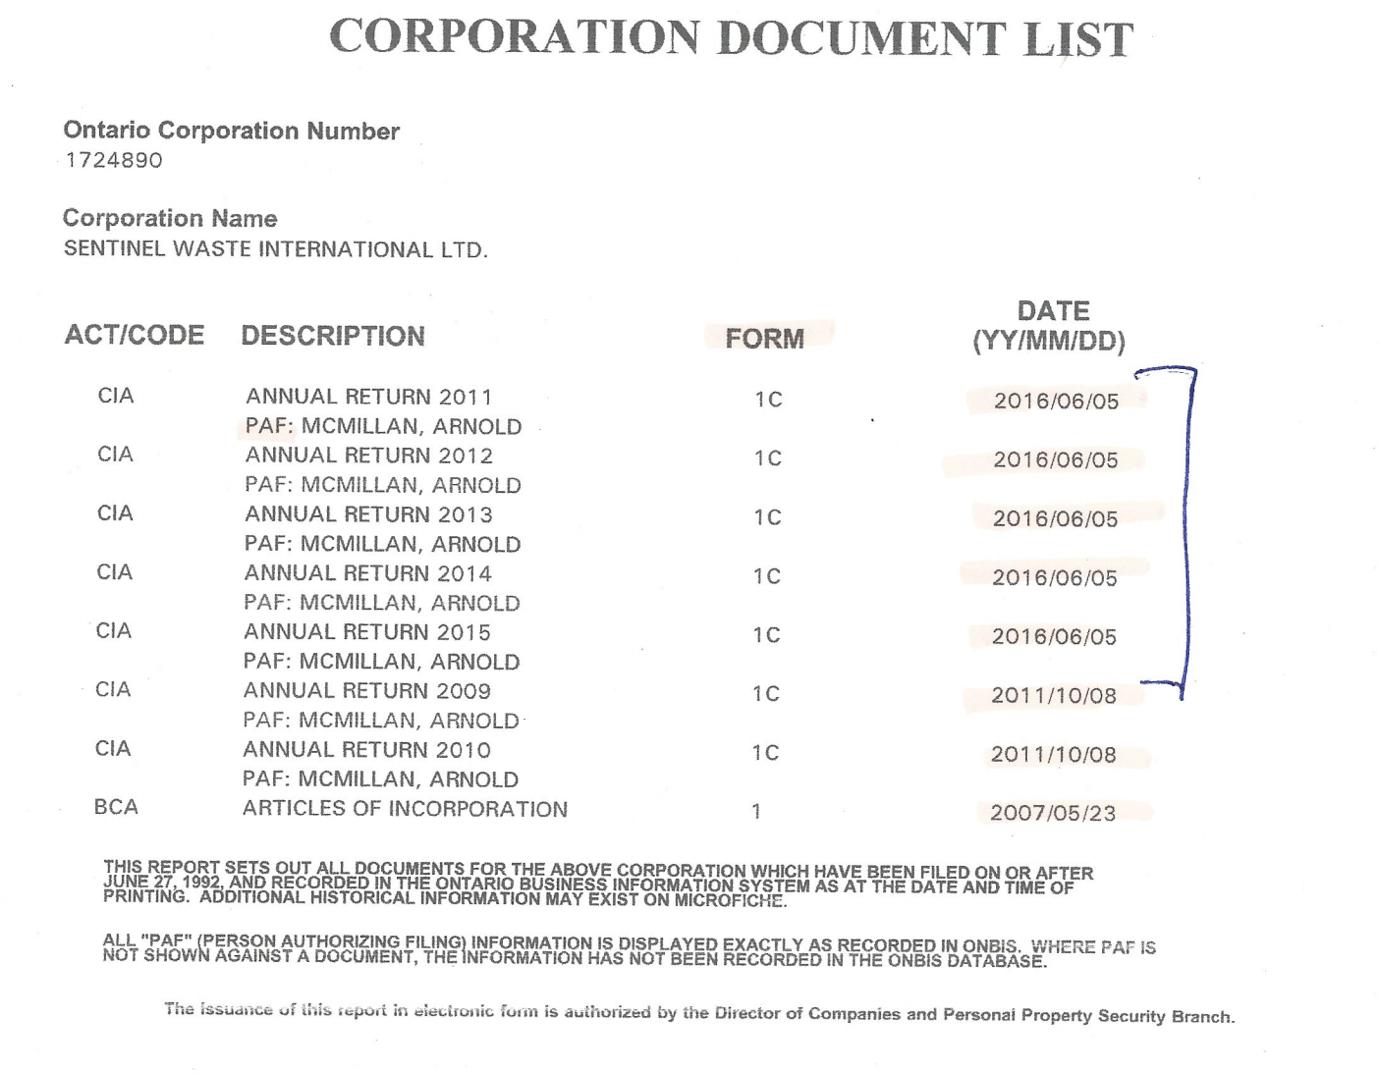 Sentinel Waste International Ltd filing history